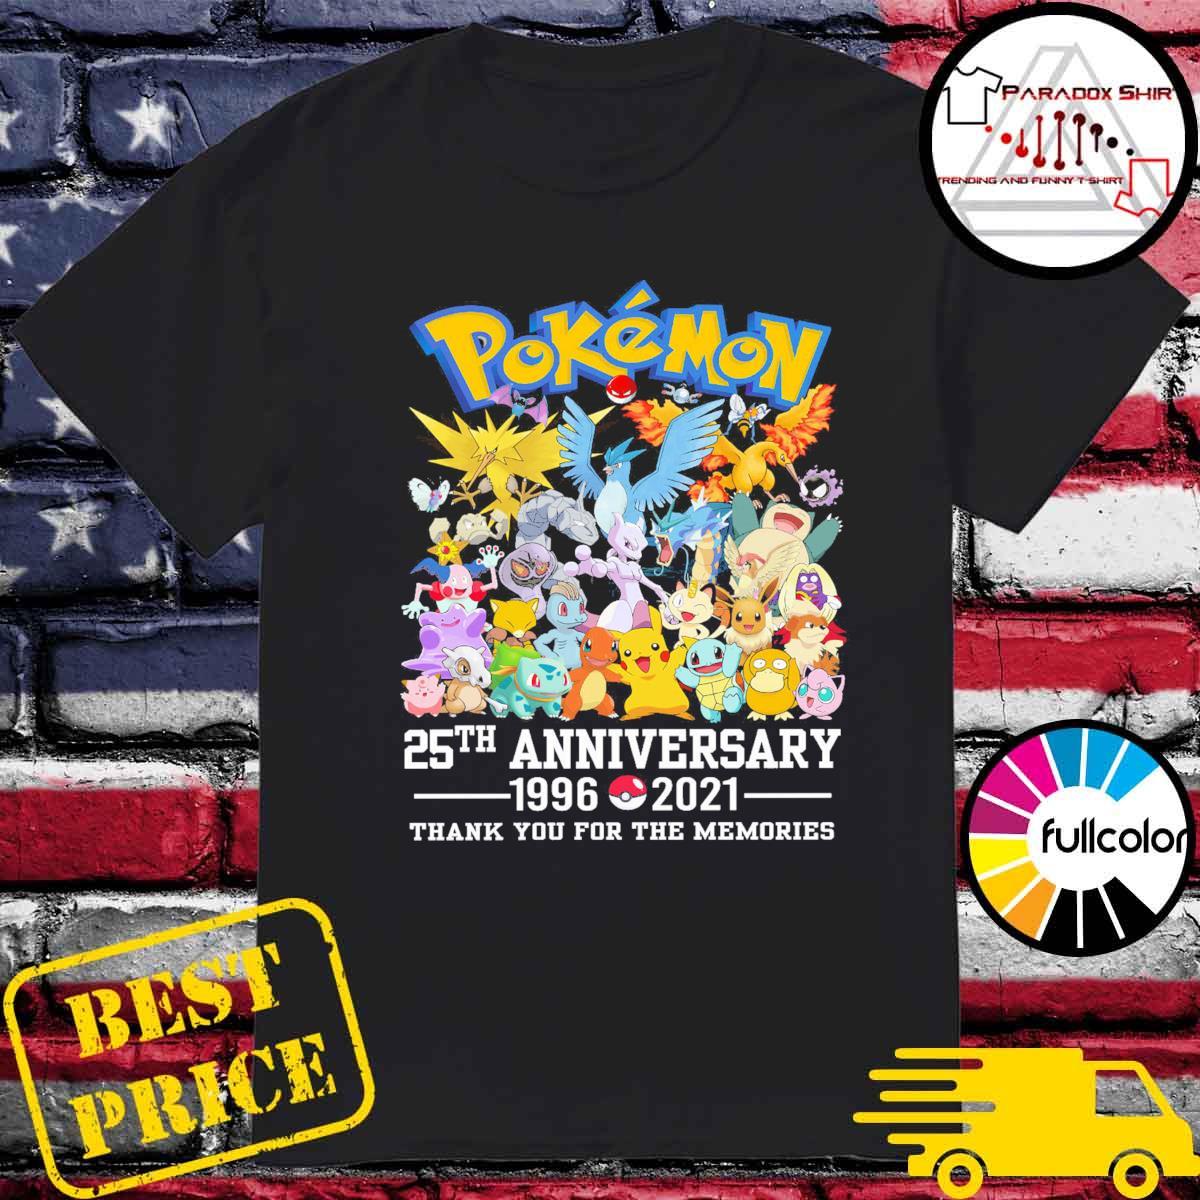 Pokémon 25th anniversary 1996 2021 thank you for the memories shirt